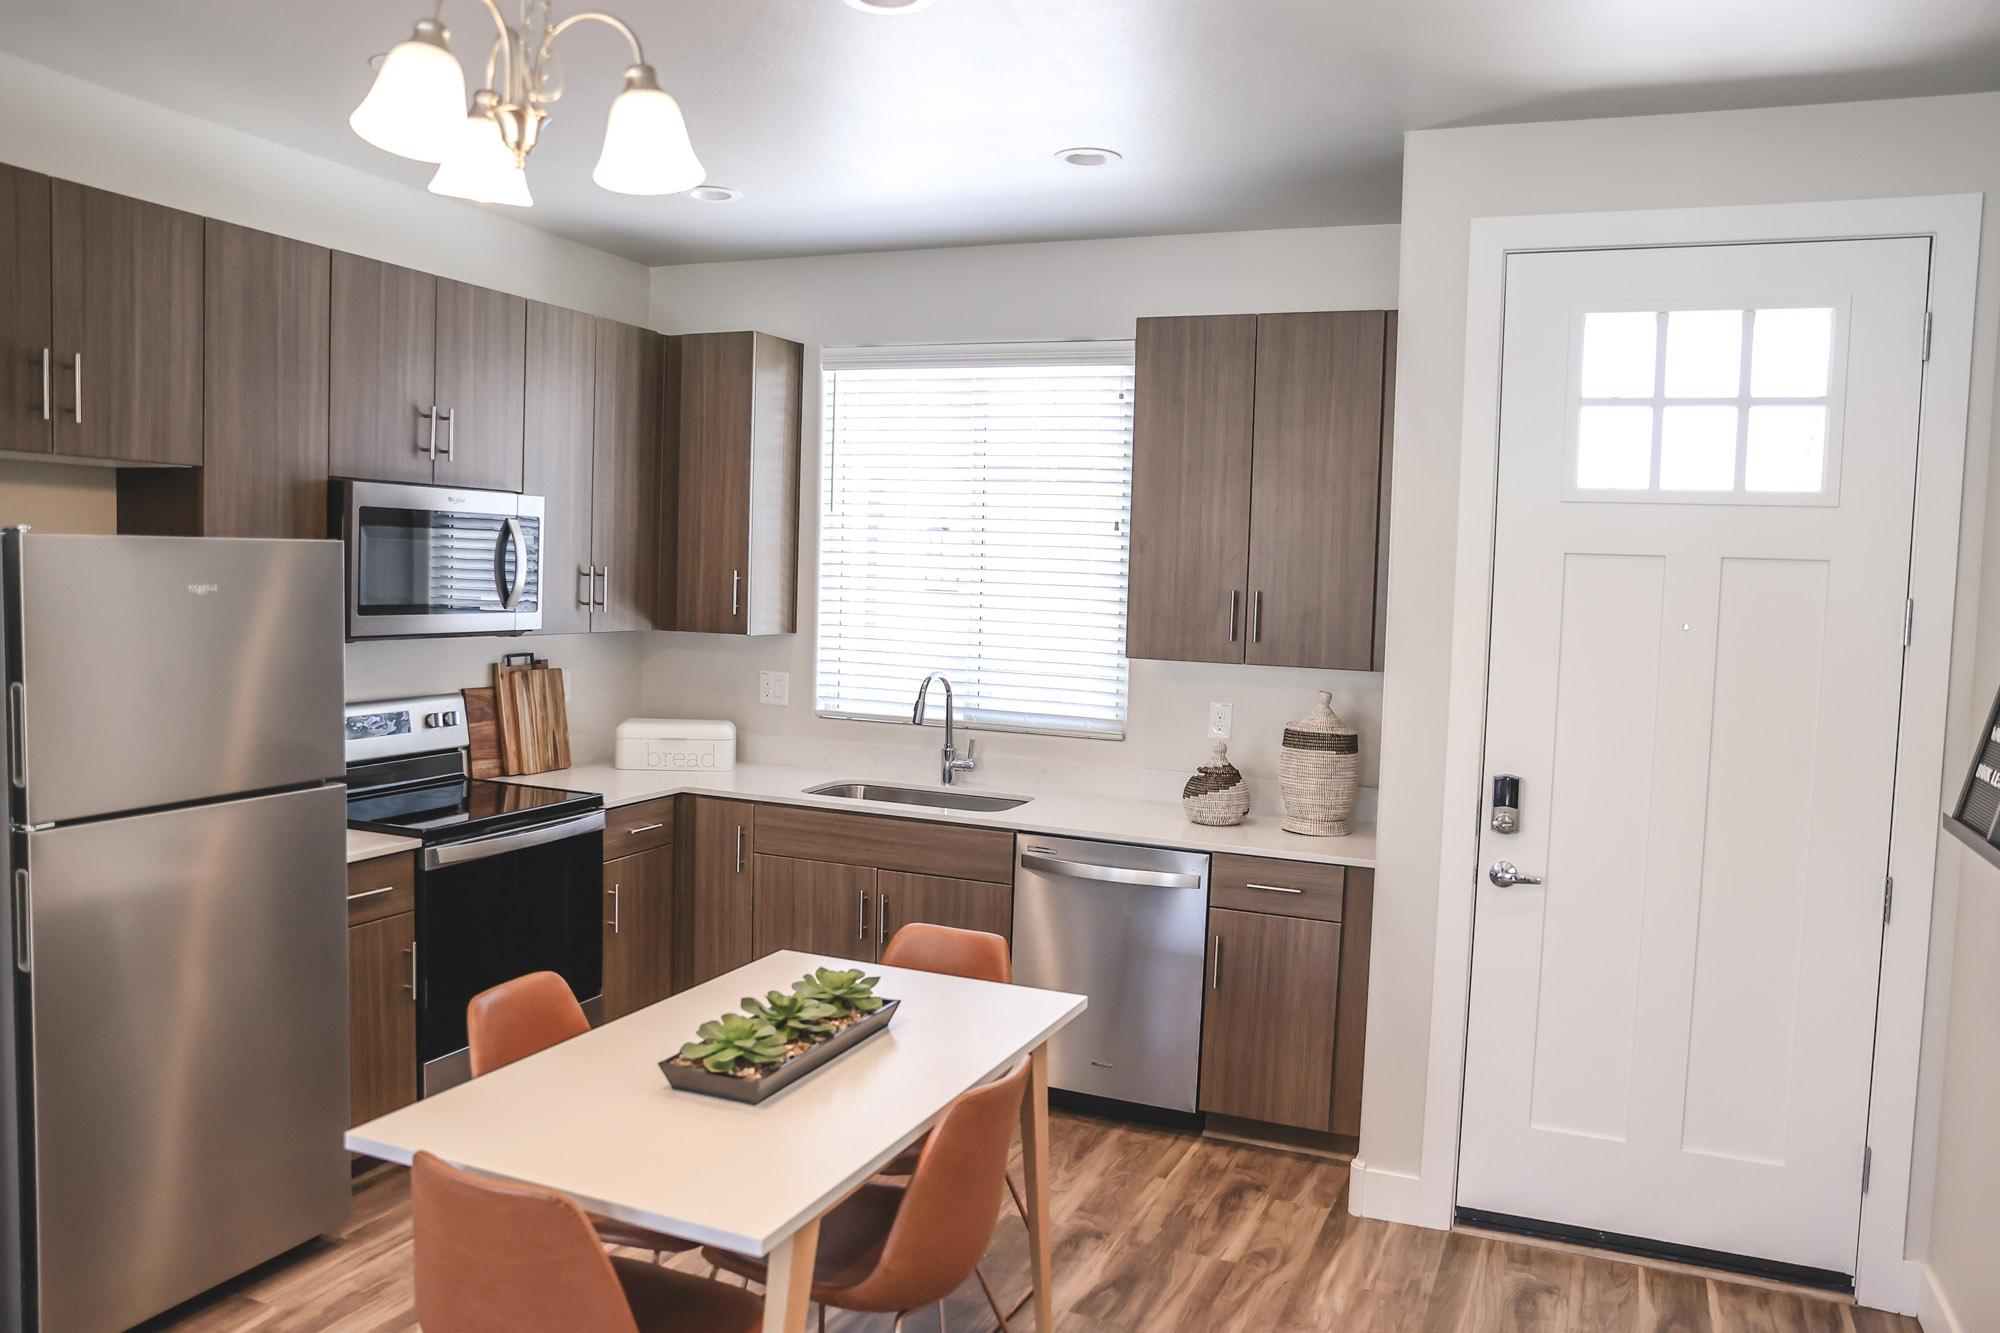 Kitchen at Village at Olive Marketplace Apartments in Glendale, AZ